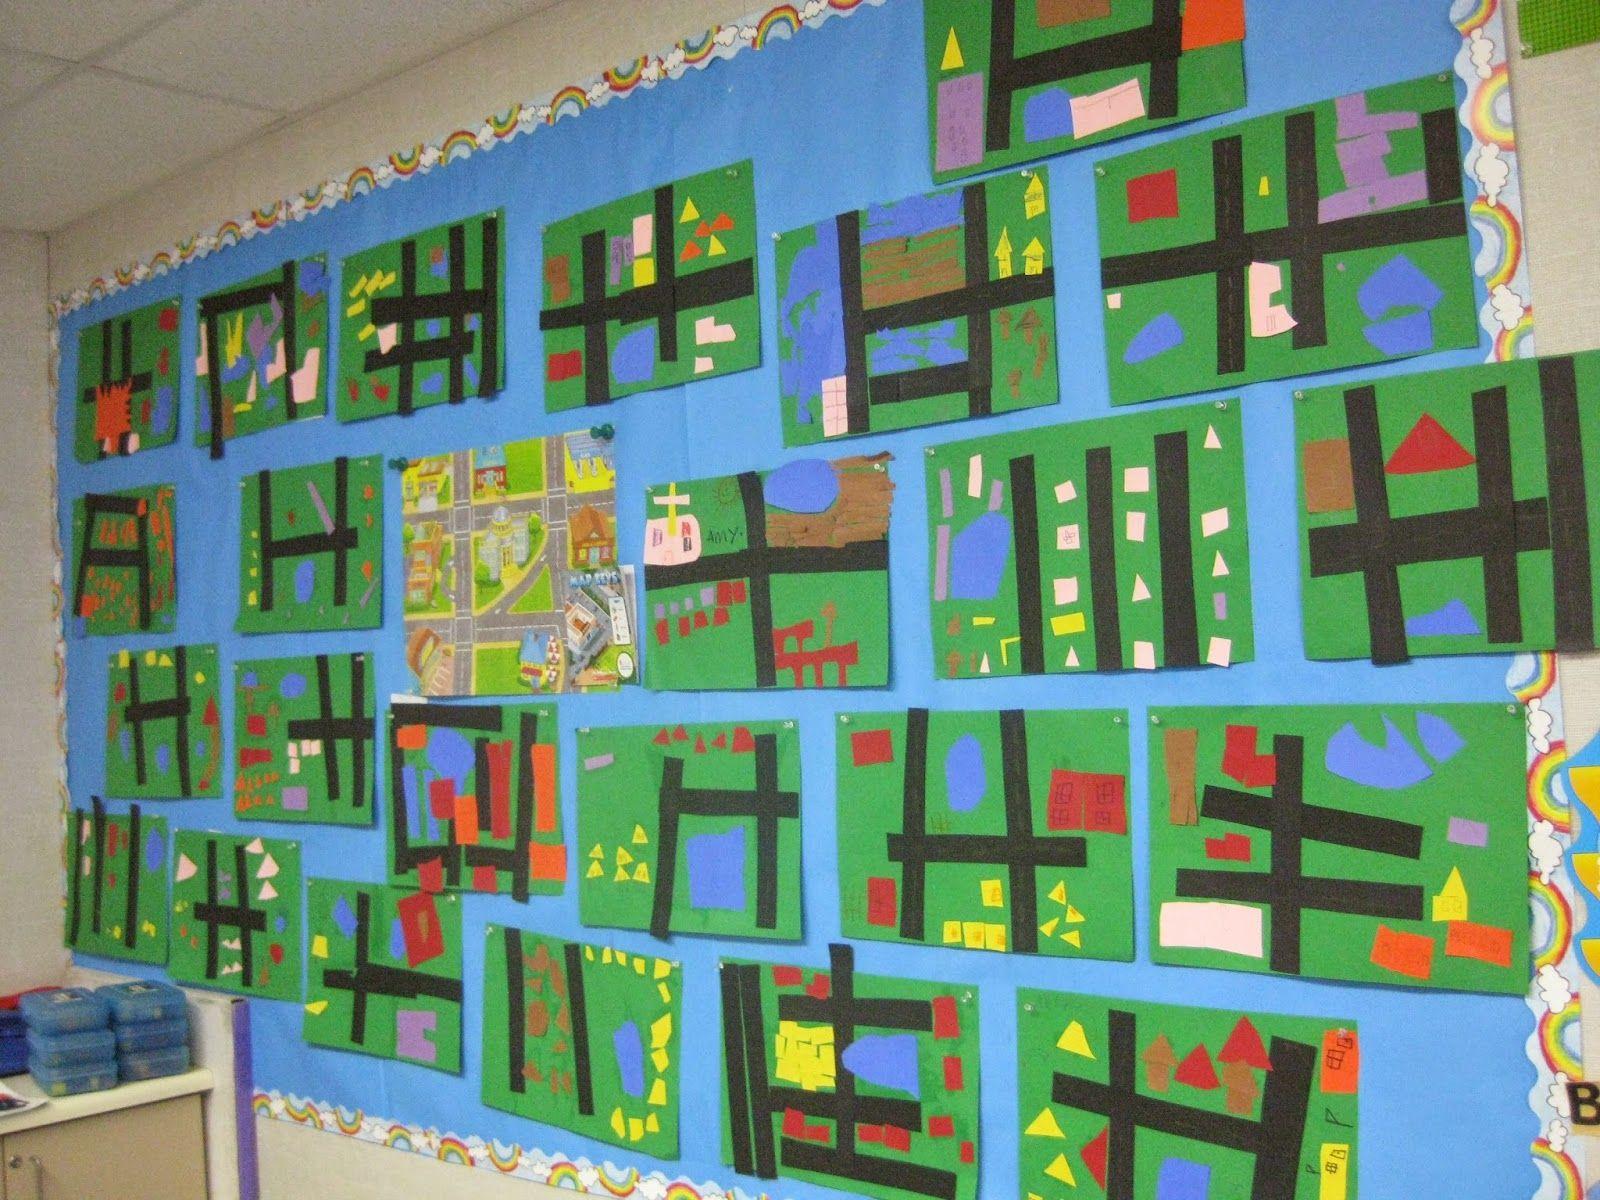 Scrapbook ideas kindergarten - My Blog Social Studies In Maps And Communities A Clear Explanation Of A My Community Activitiesmy Community Kindergartenmap